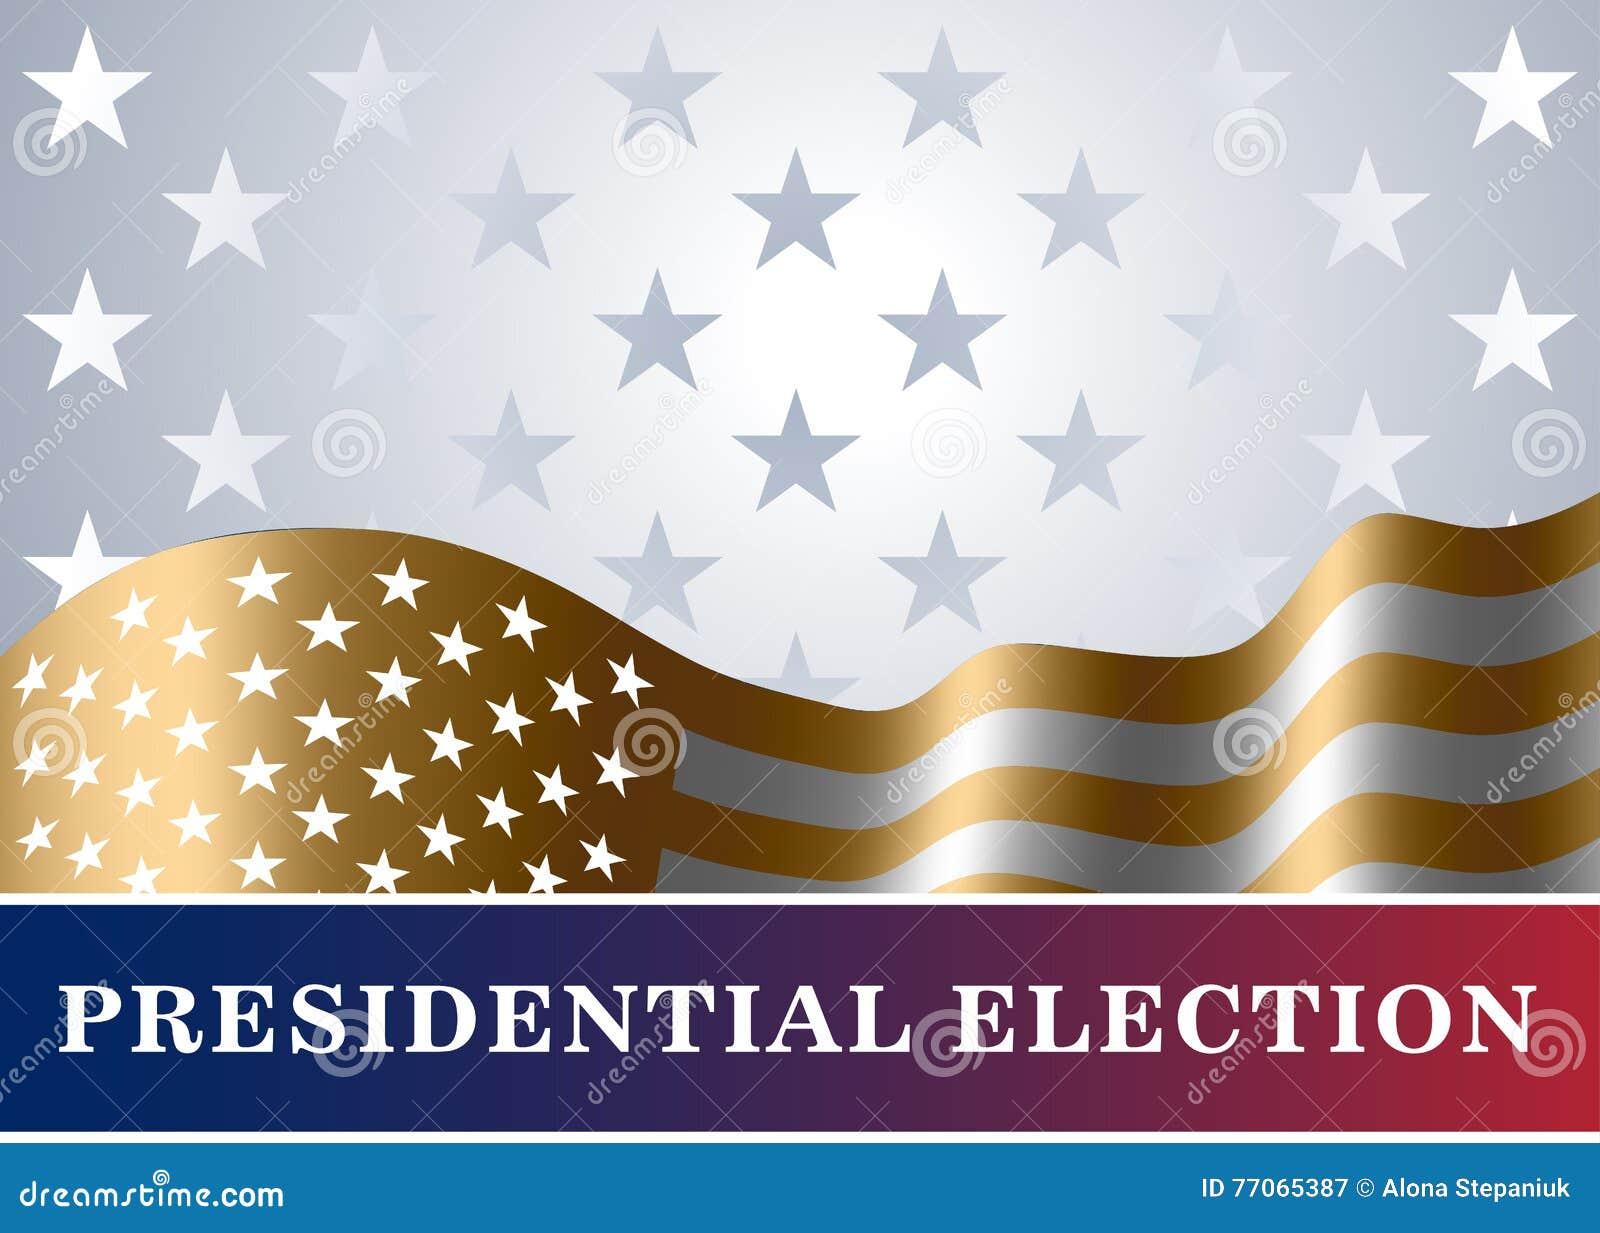 Presidential election date in Australia